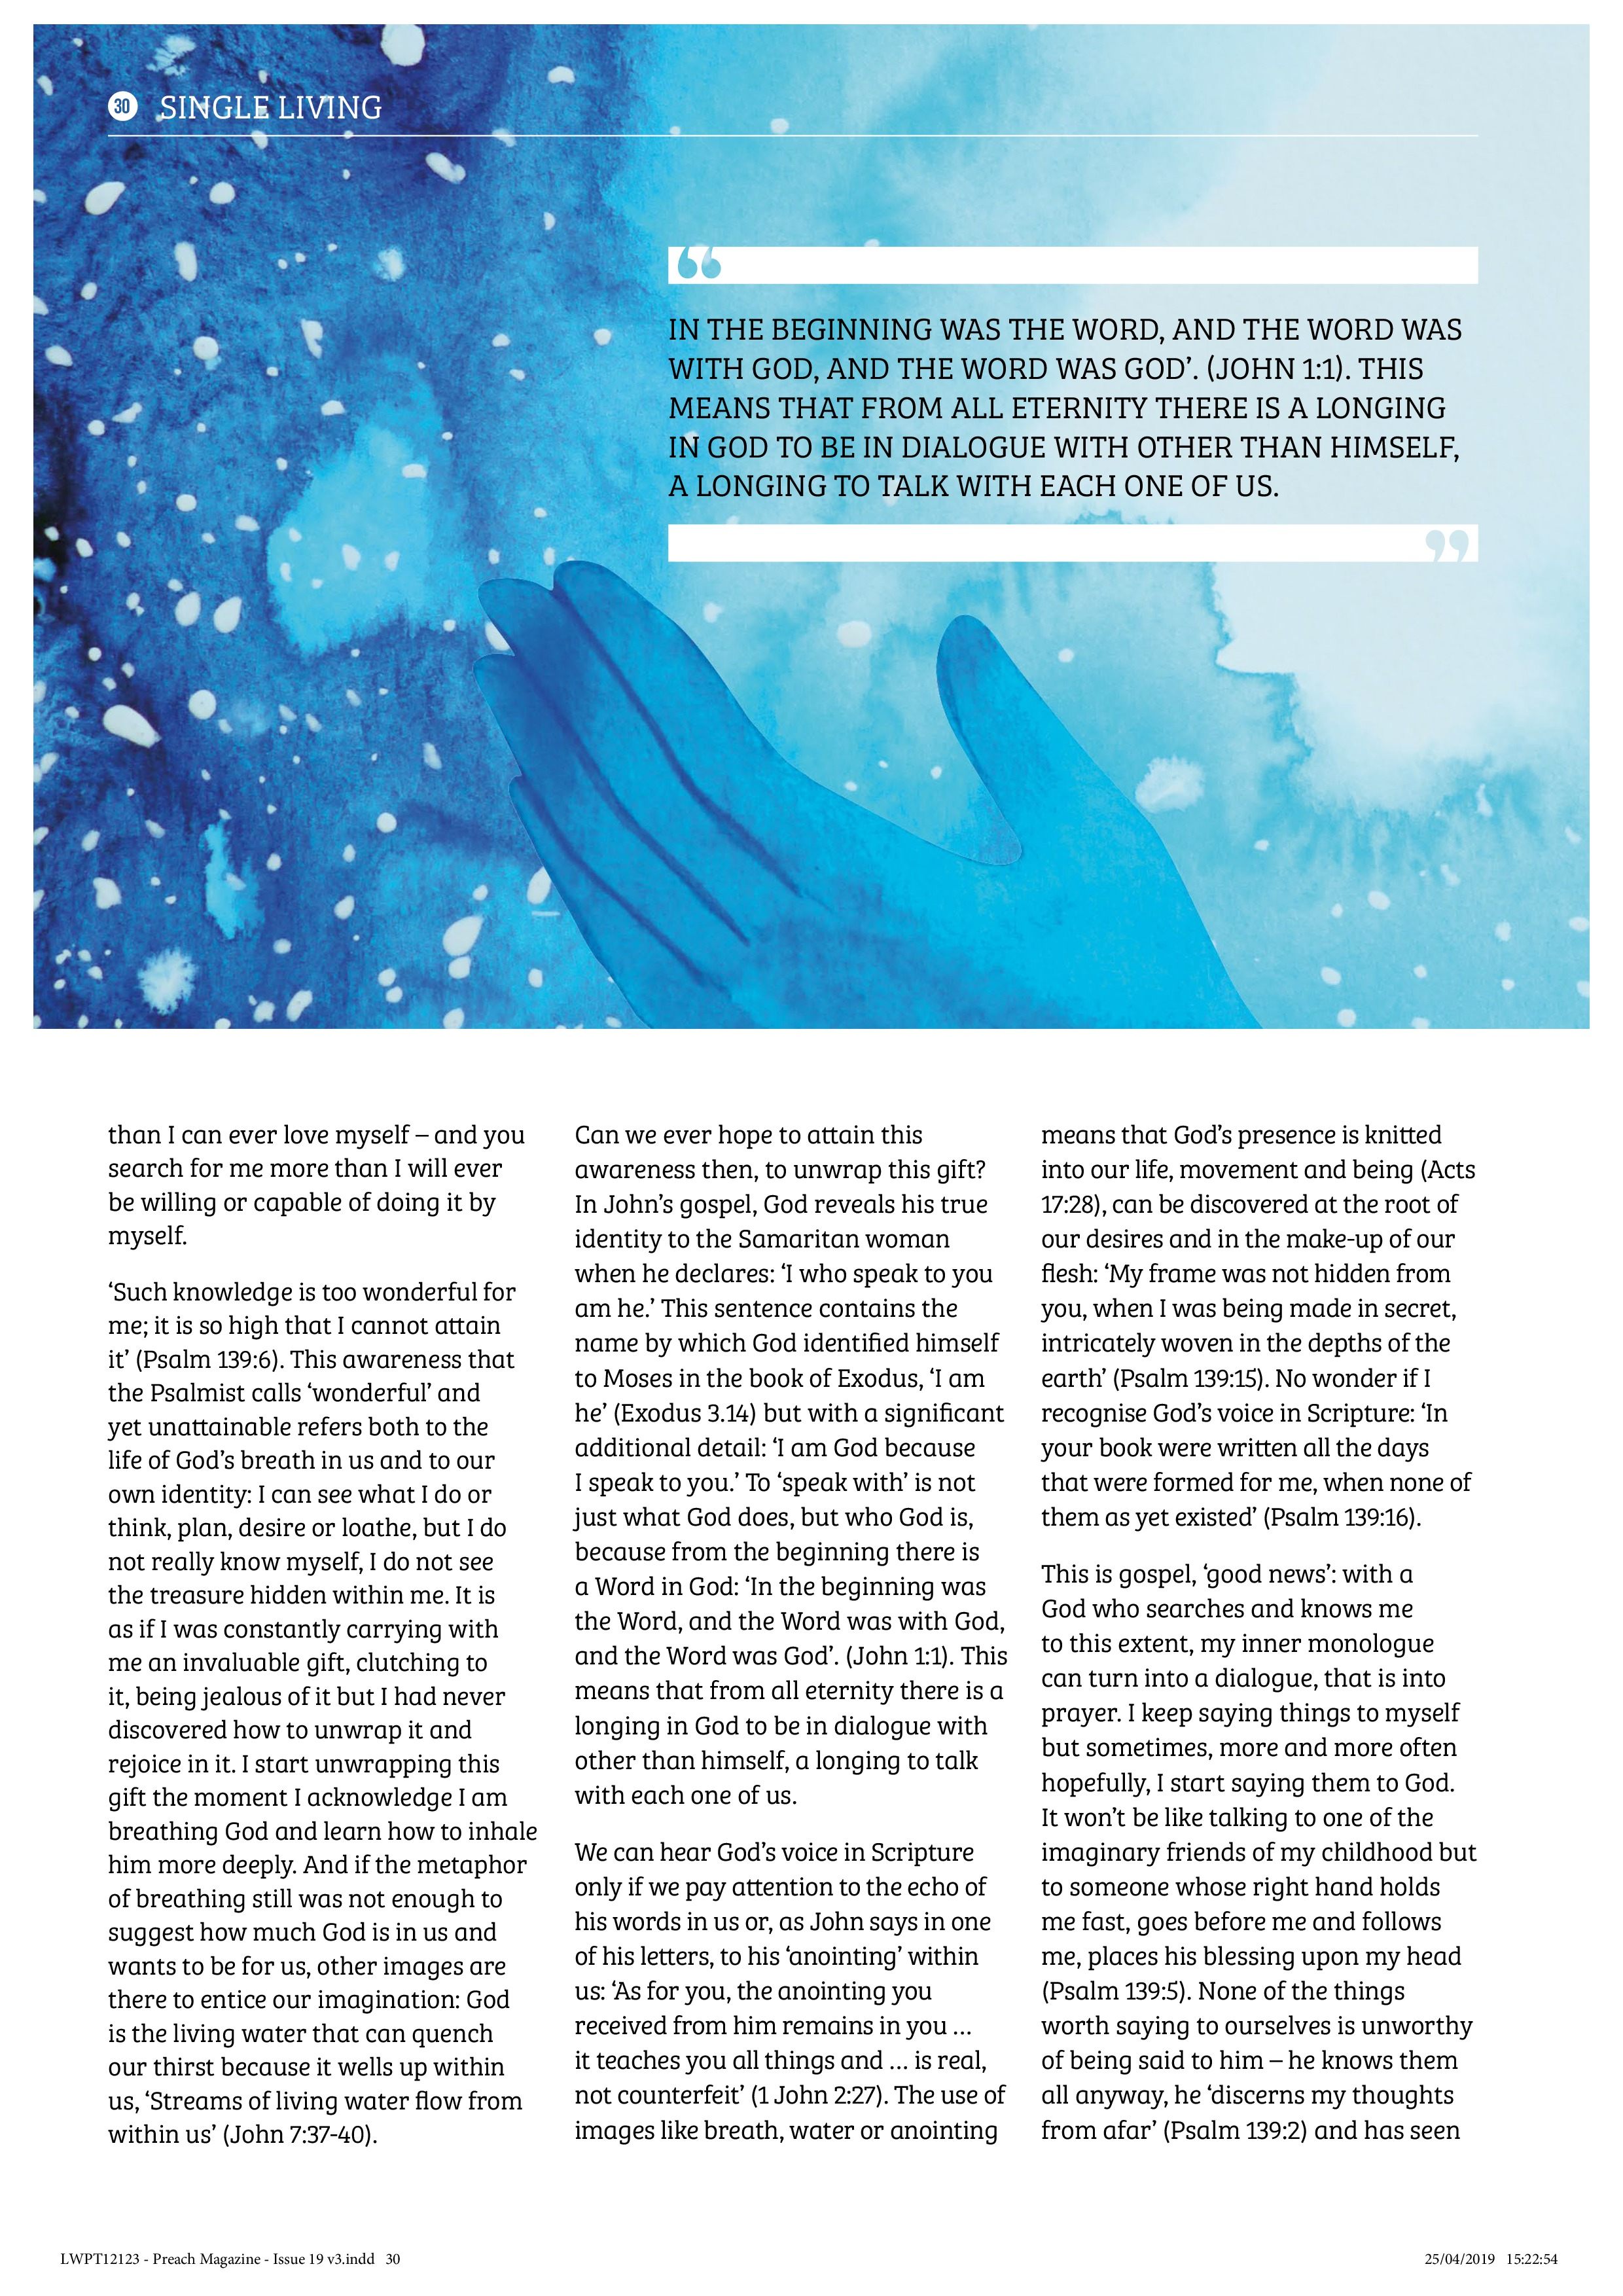 Preach Magazine - Issue 19 - Luigi Gioia-page-4.jpg